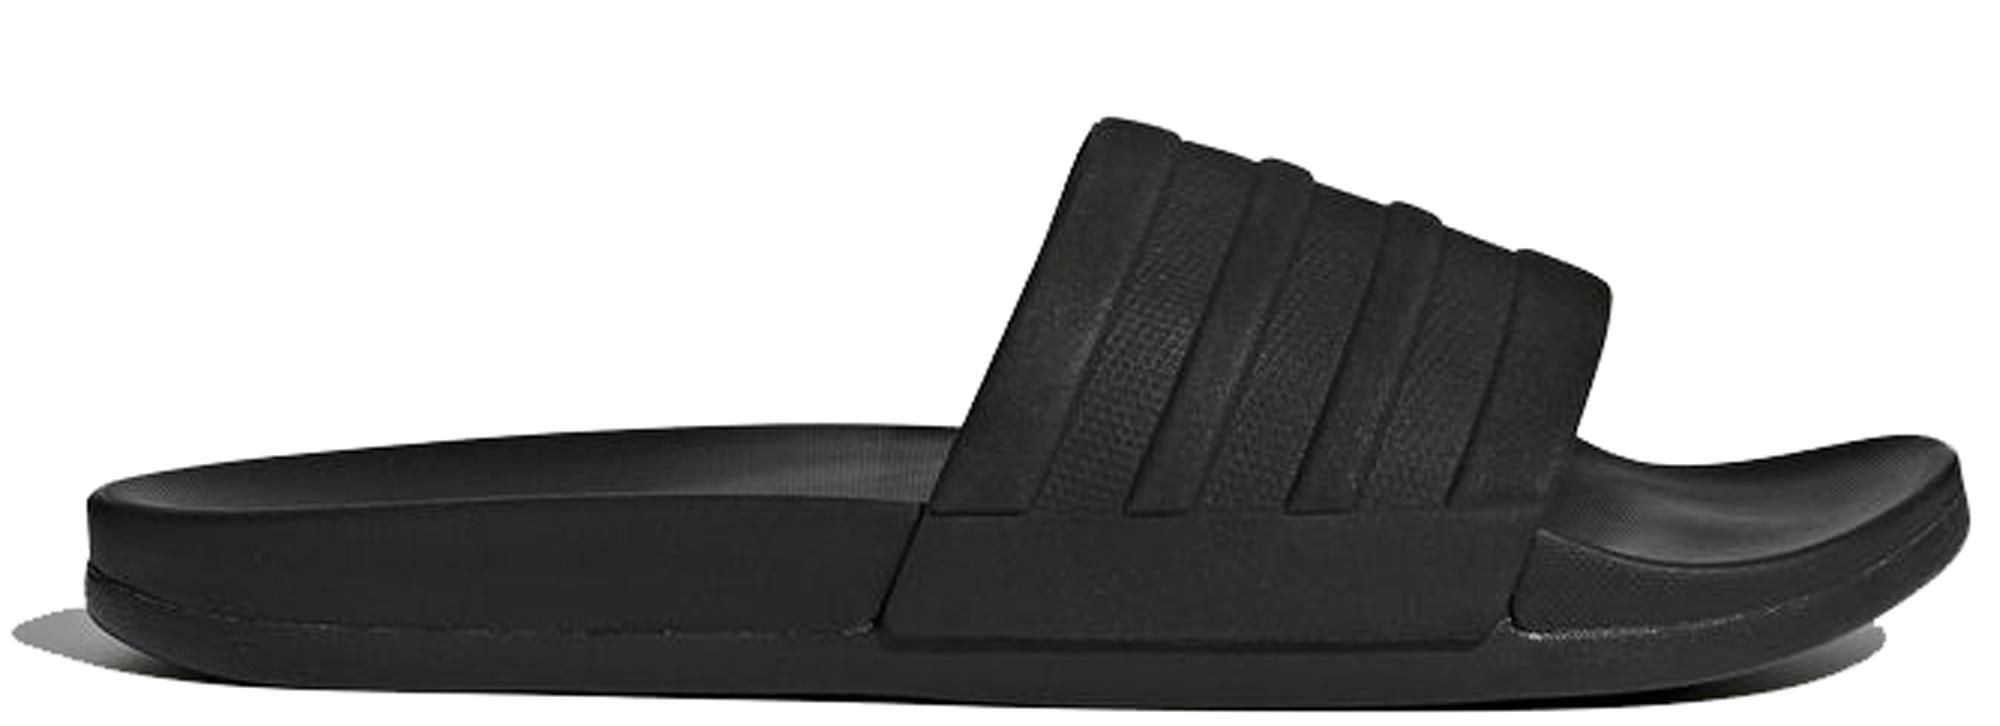 adidas adilette Cloudfoam Plus Triple Black